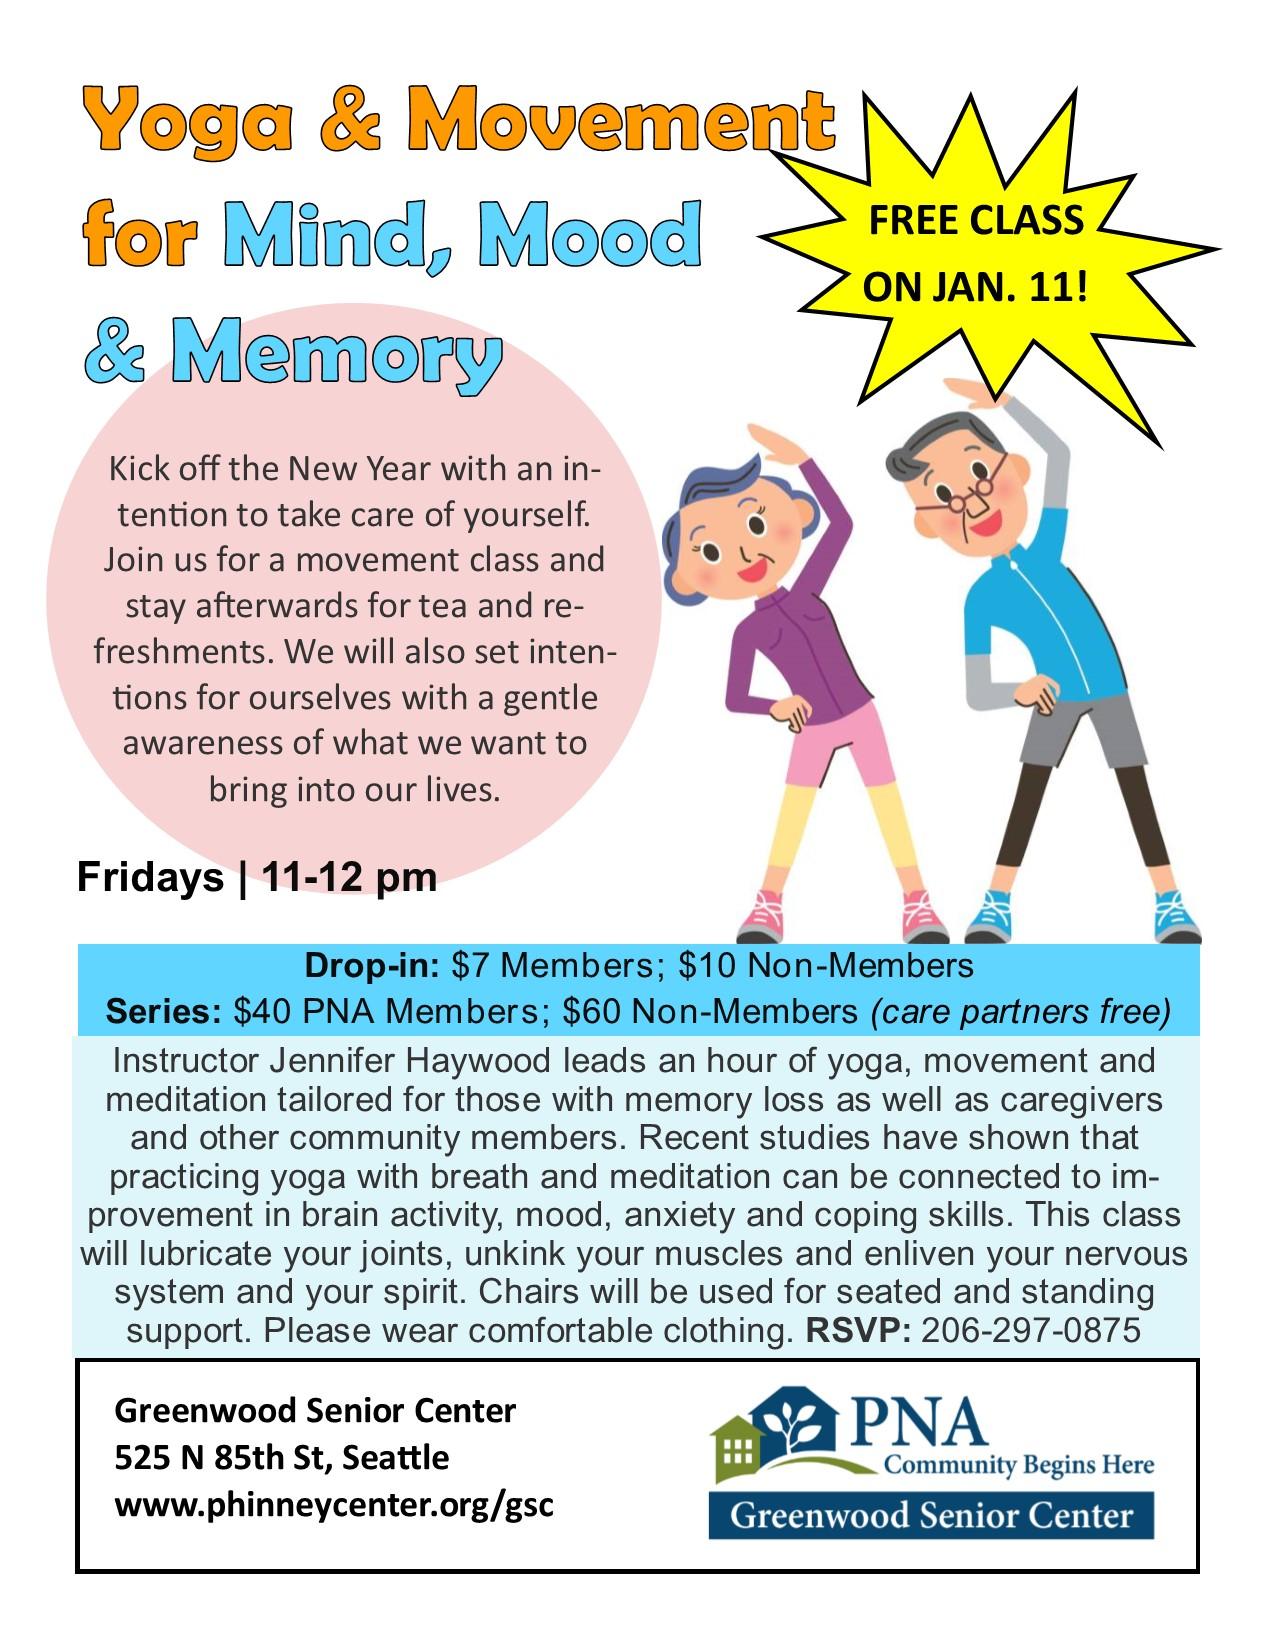 Yoga for Mood Mind Memory Momentia.jpg